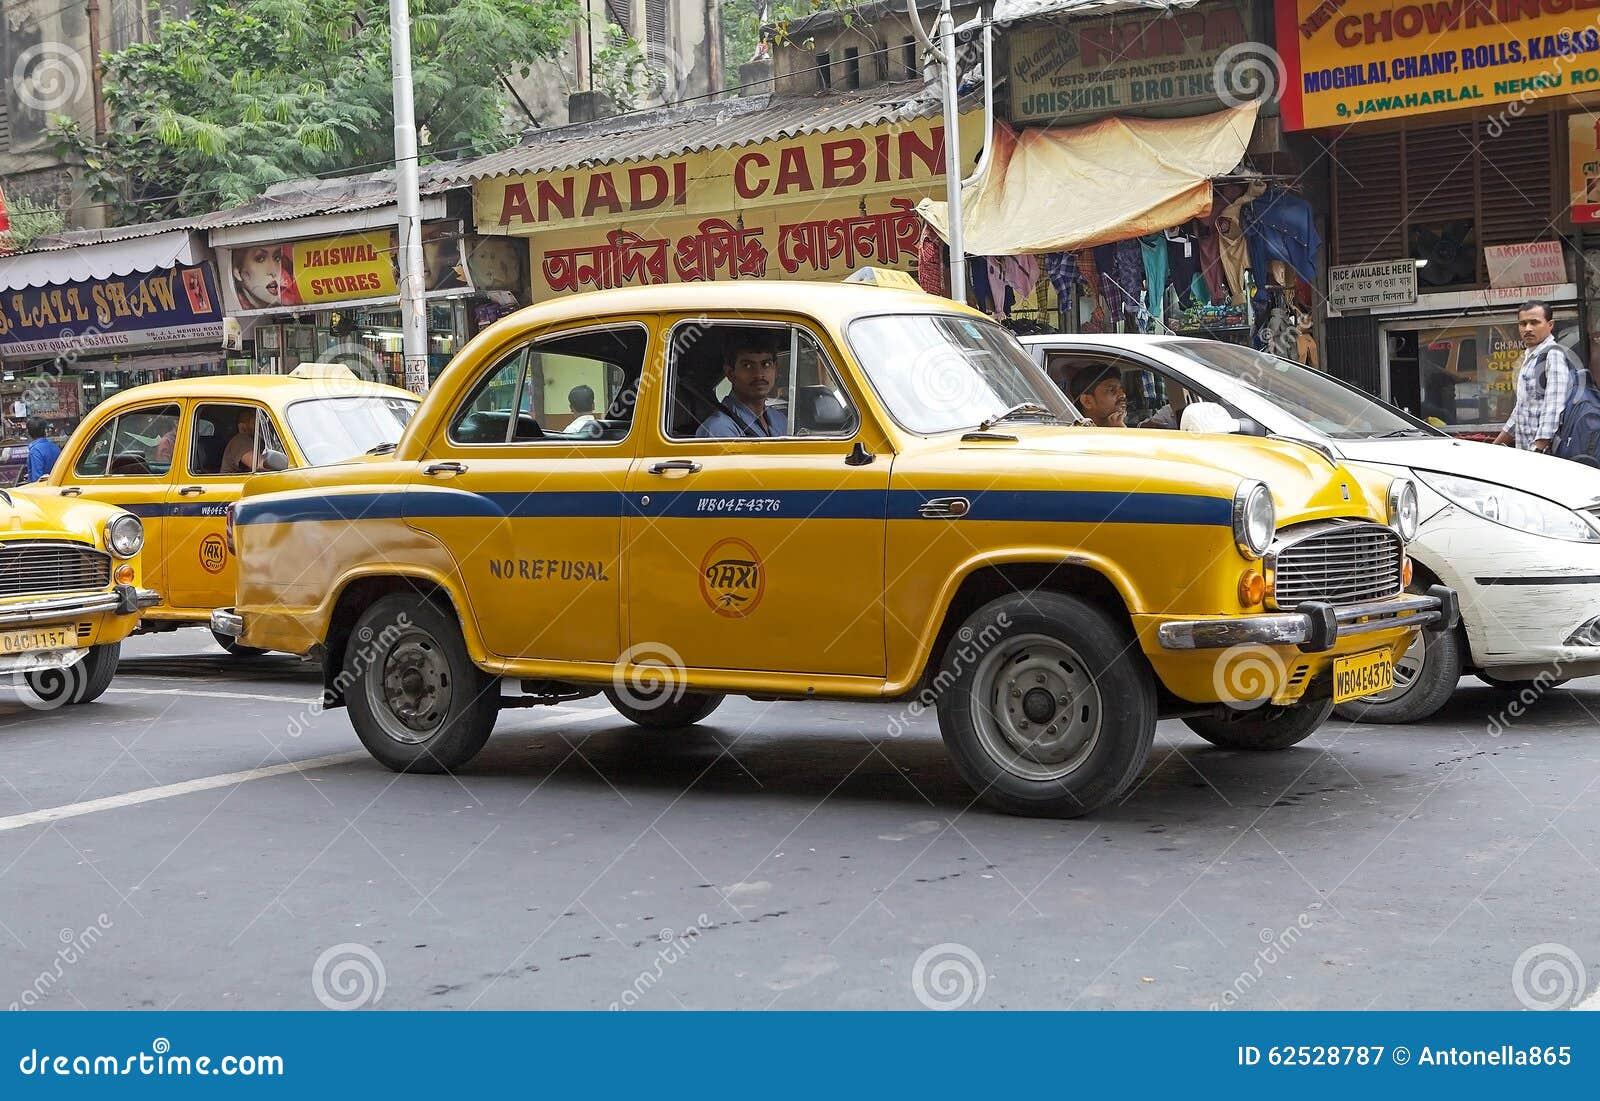 Taxi in Kolkata, India